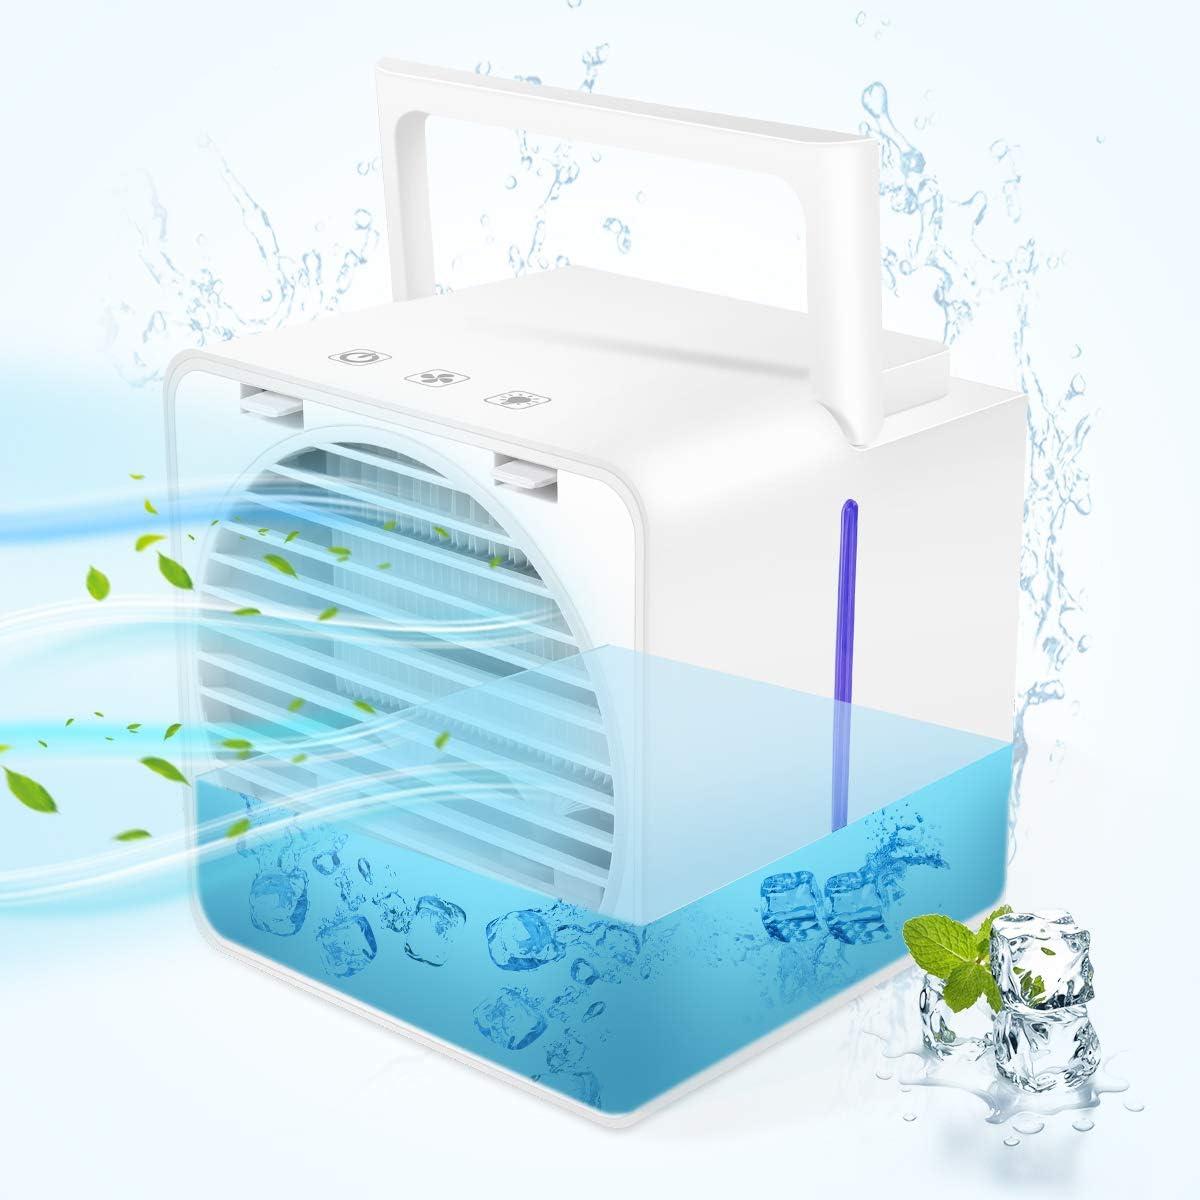 Mini 5☆好評 Air Conditioner Portable Cooler 商い Air-Co Upgrade Model